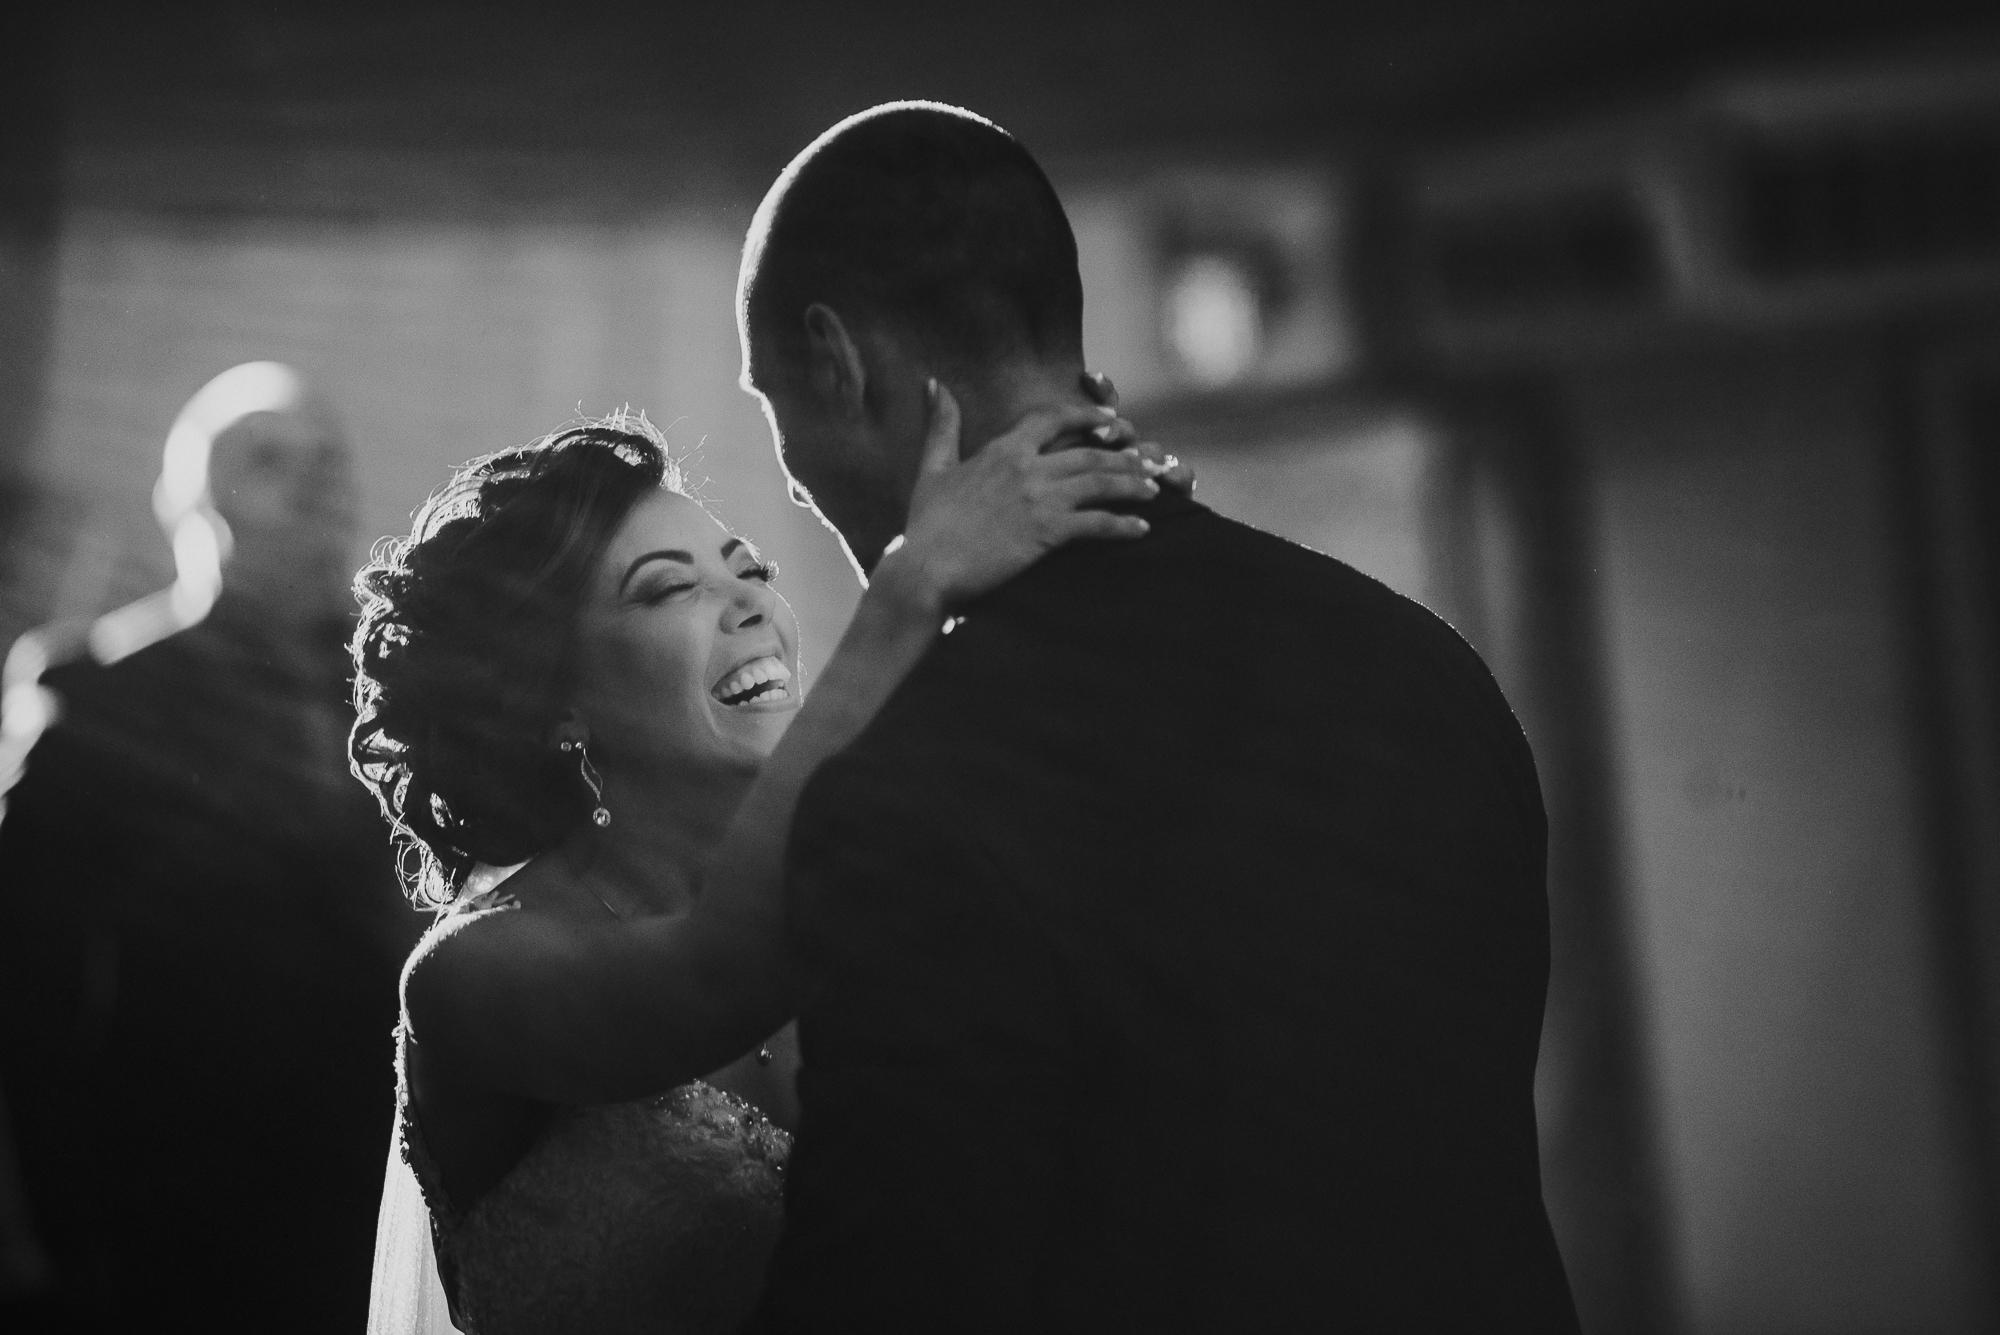 Christina-and-Gene-Wedding-Marla-Rain-Photography-485.jpg